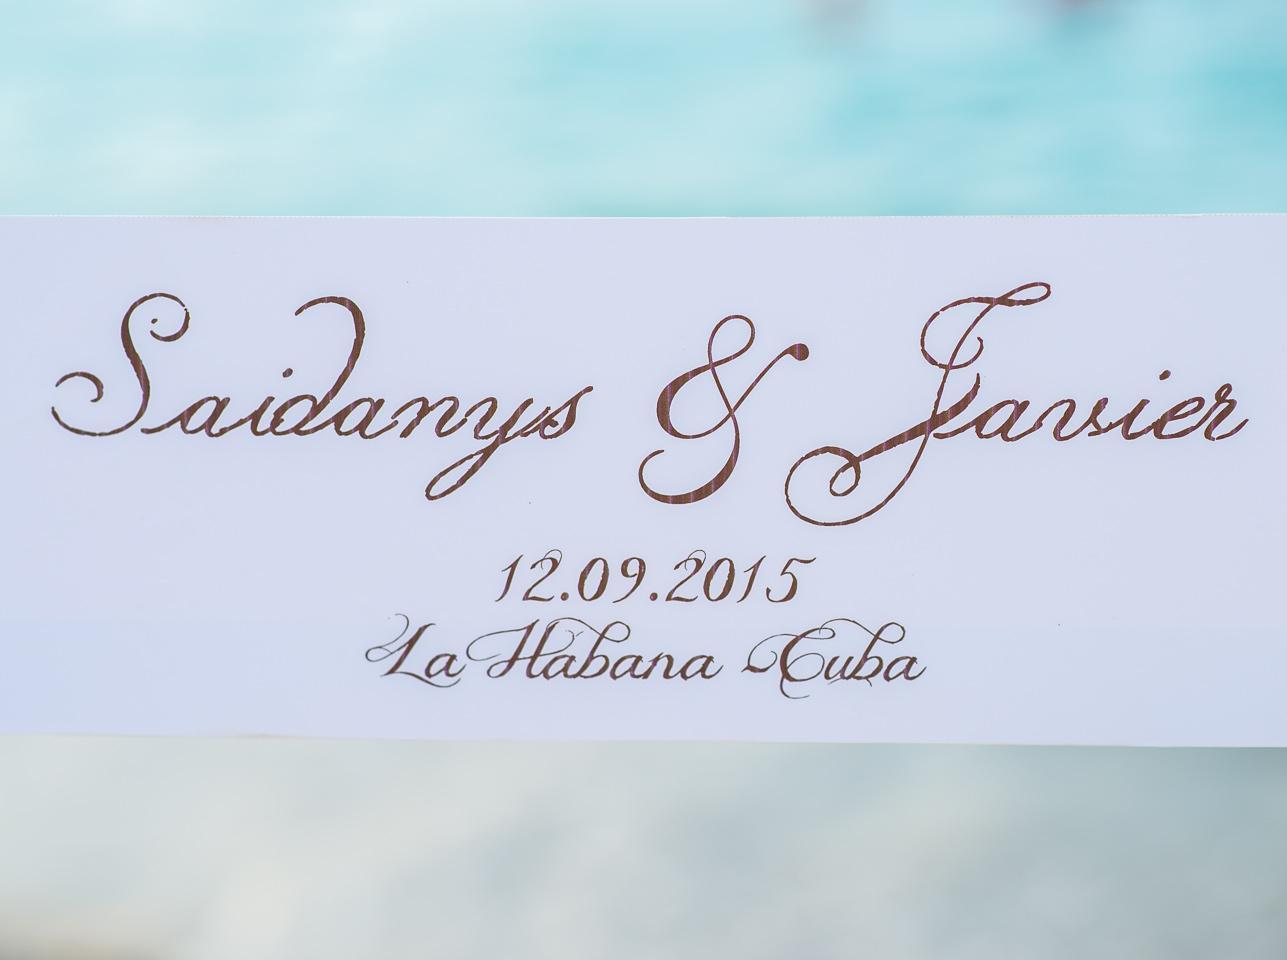 bodas-rustico-playa-cuba-5662.jpg